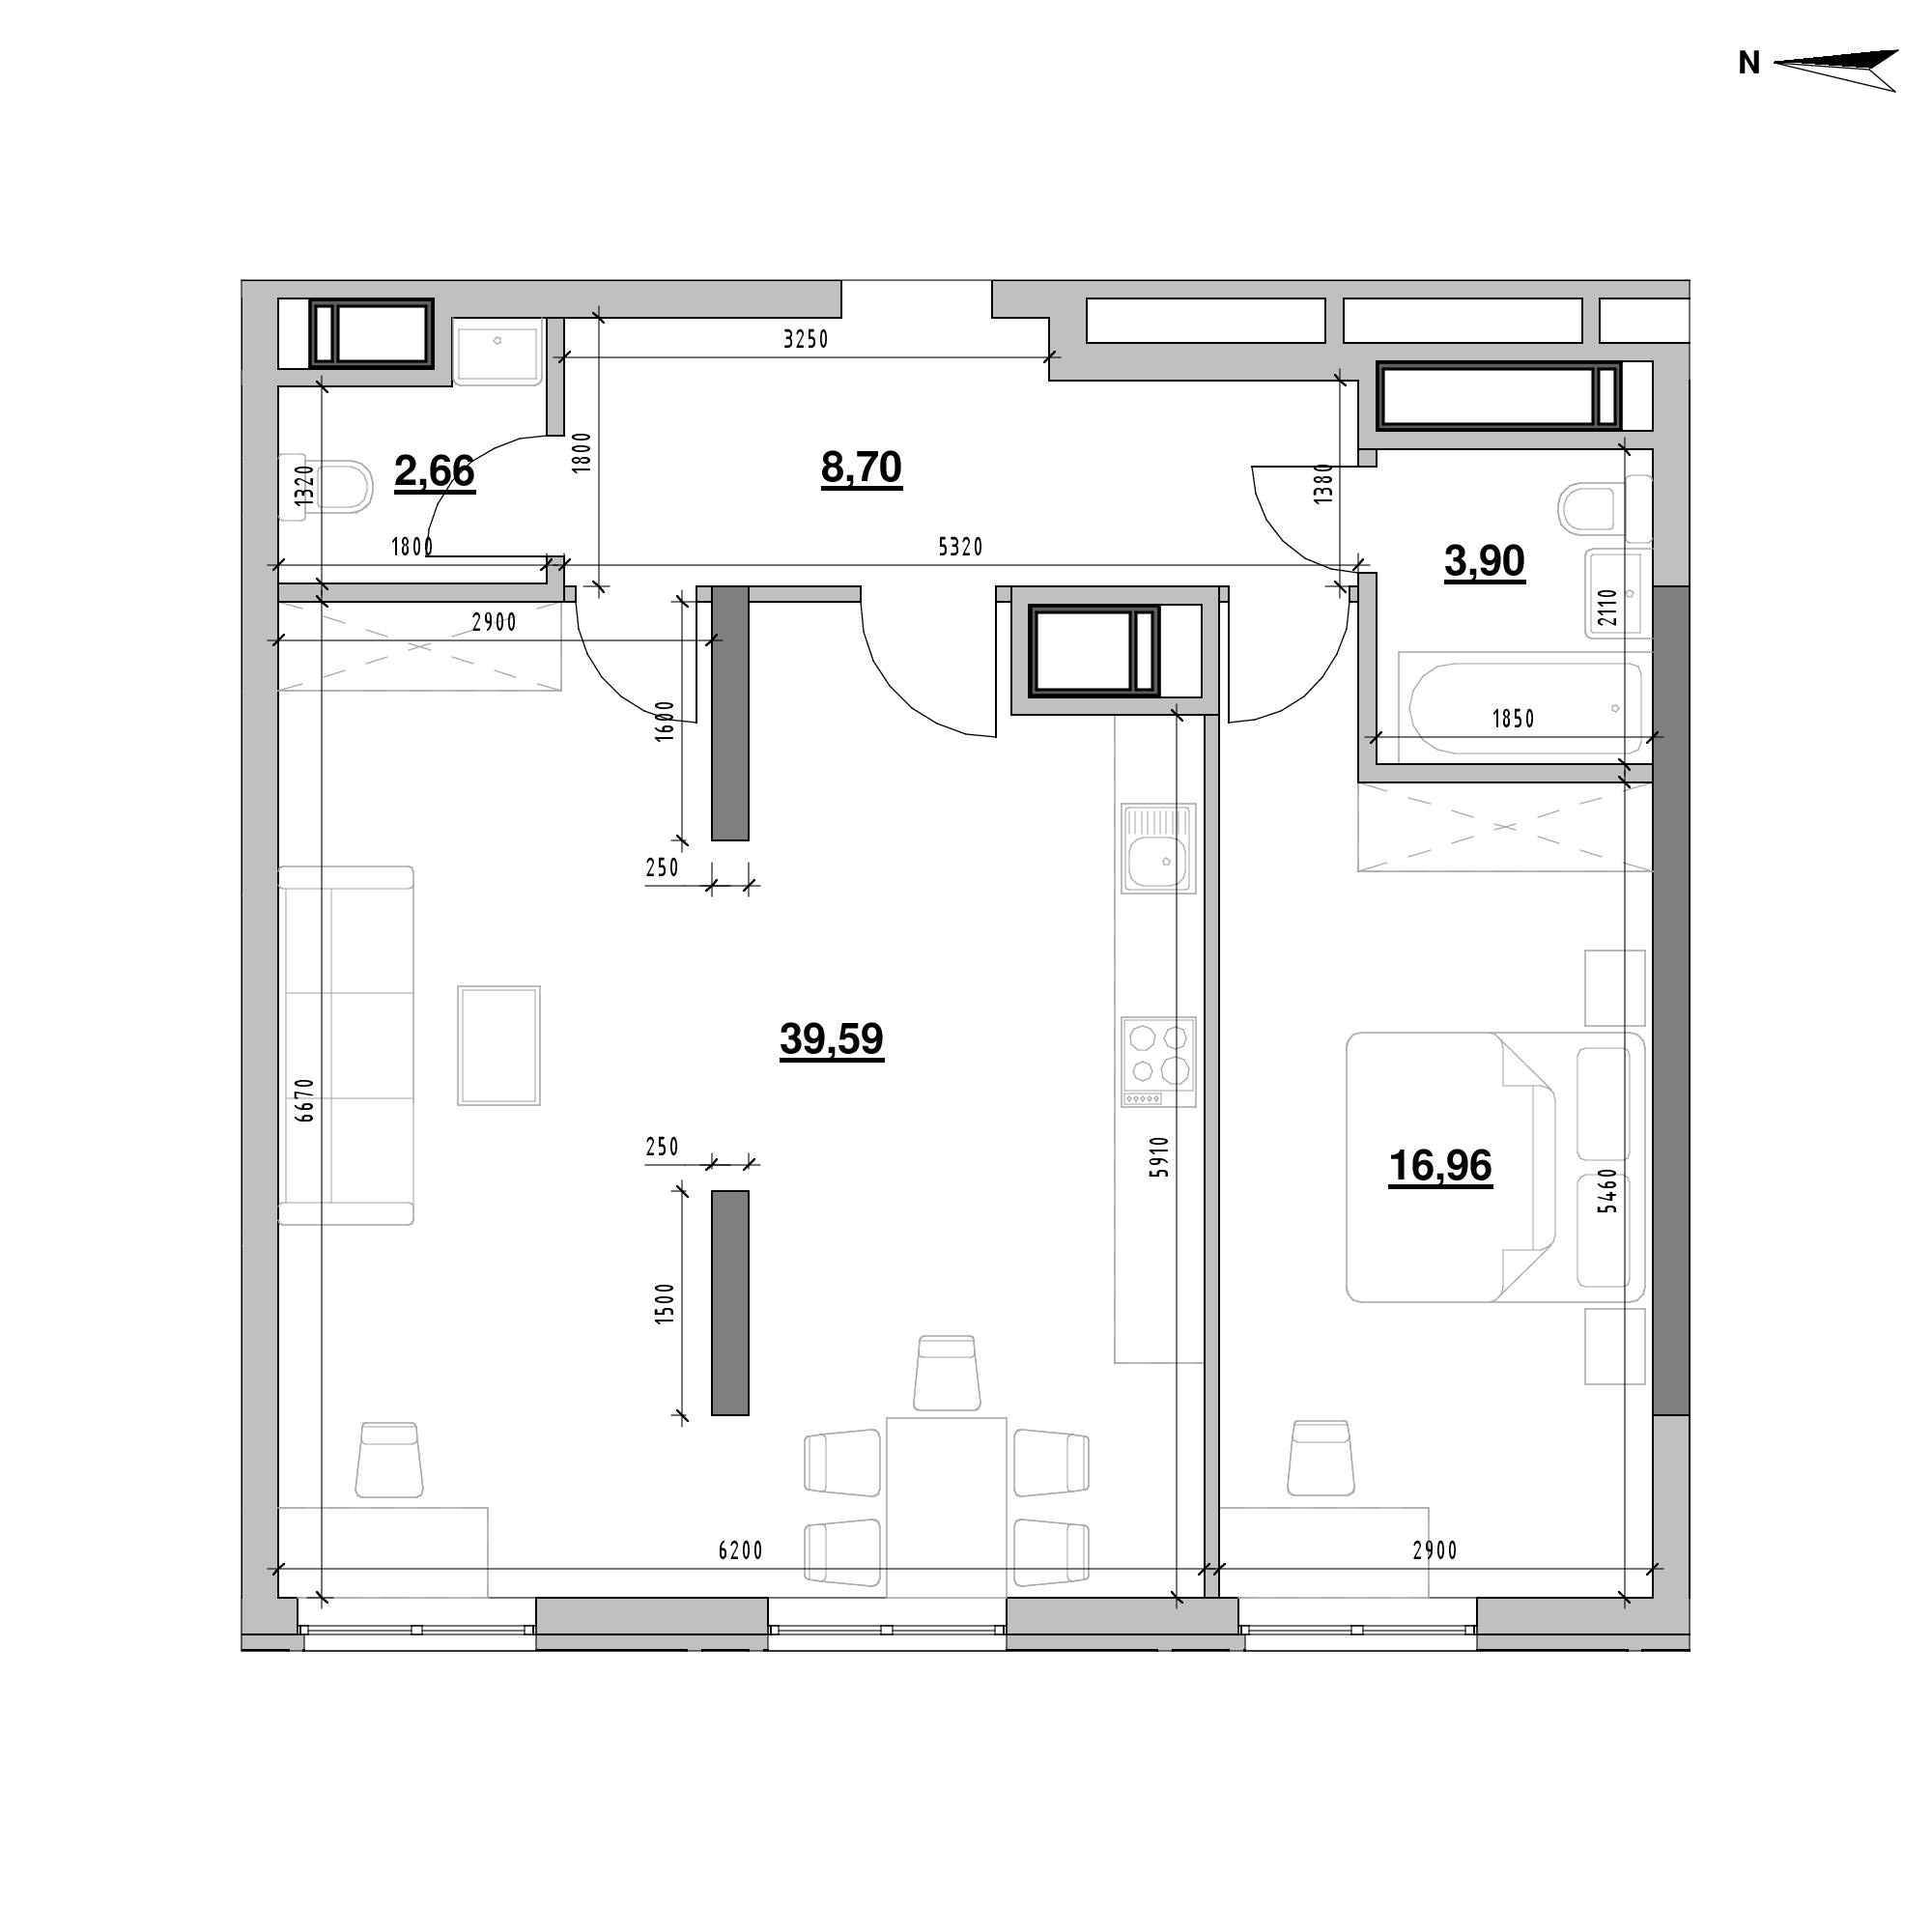 ЖК Nordica Residence: планування 1-кімнатної квартири, №139, 71.81 м<sup>2</sup>